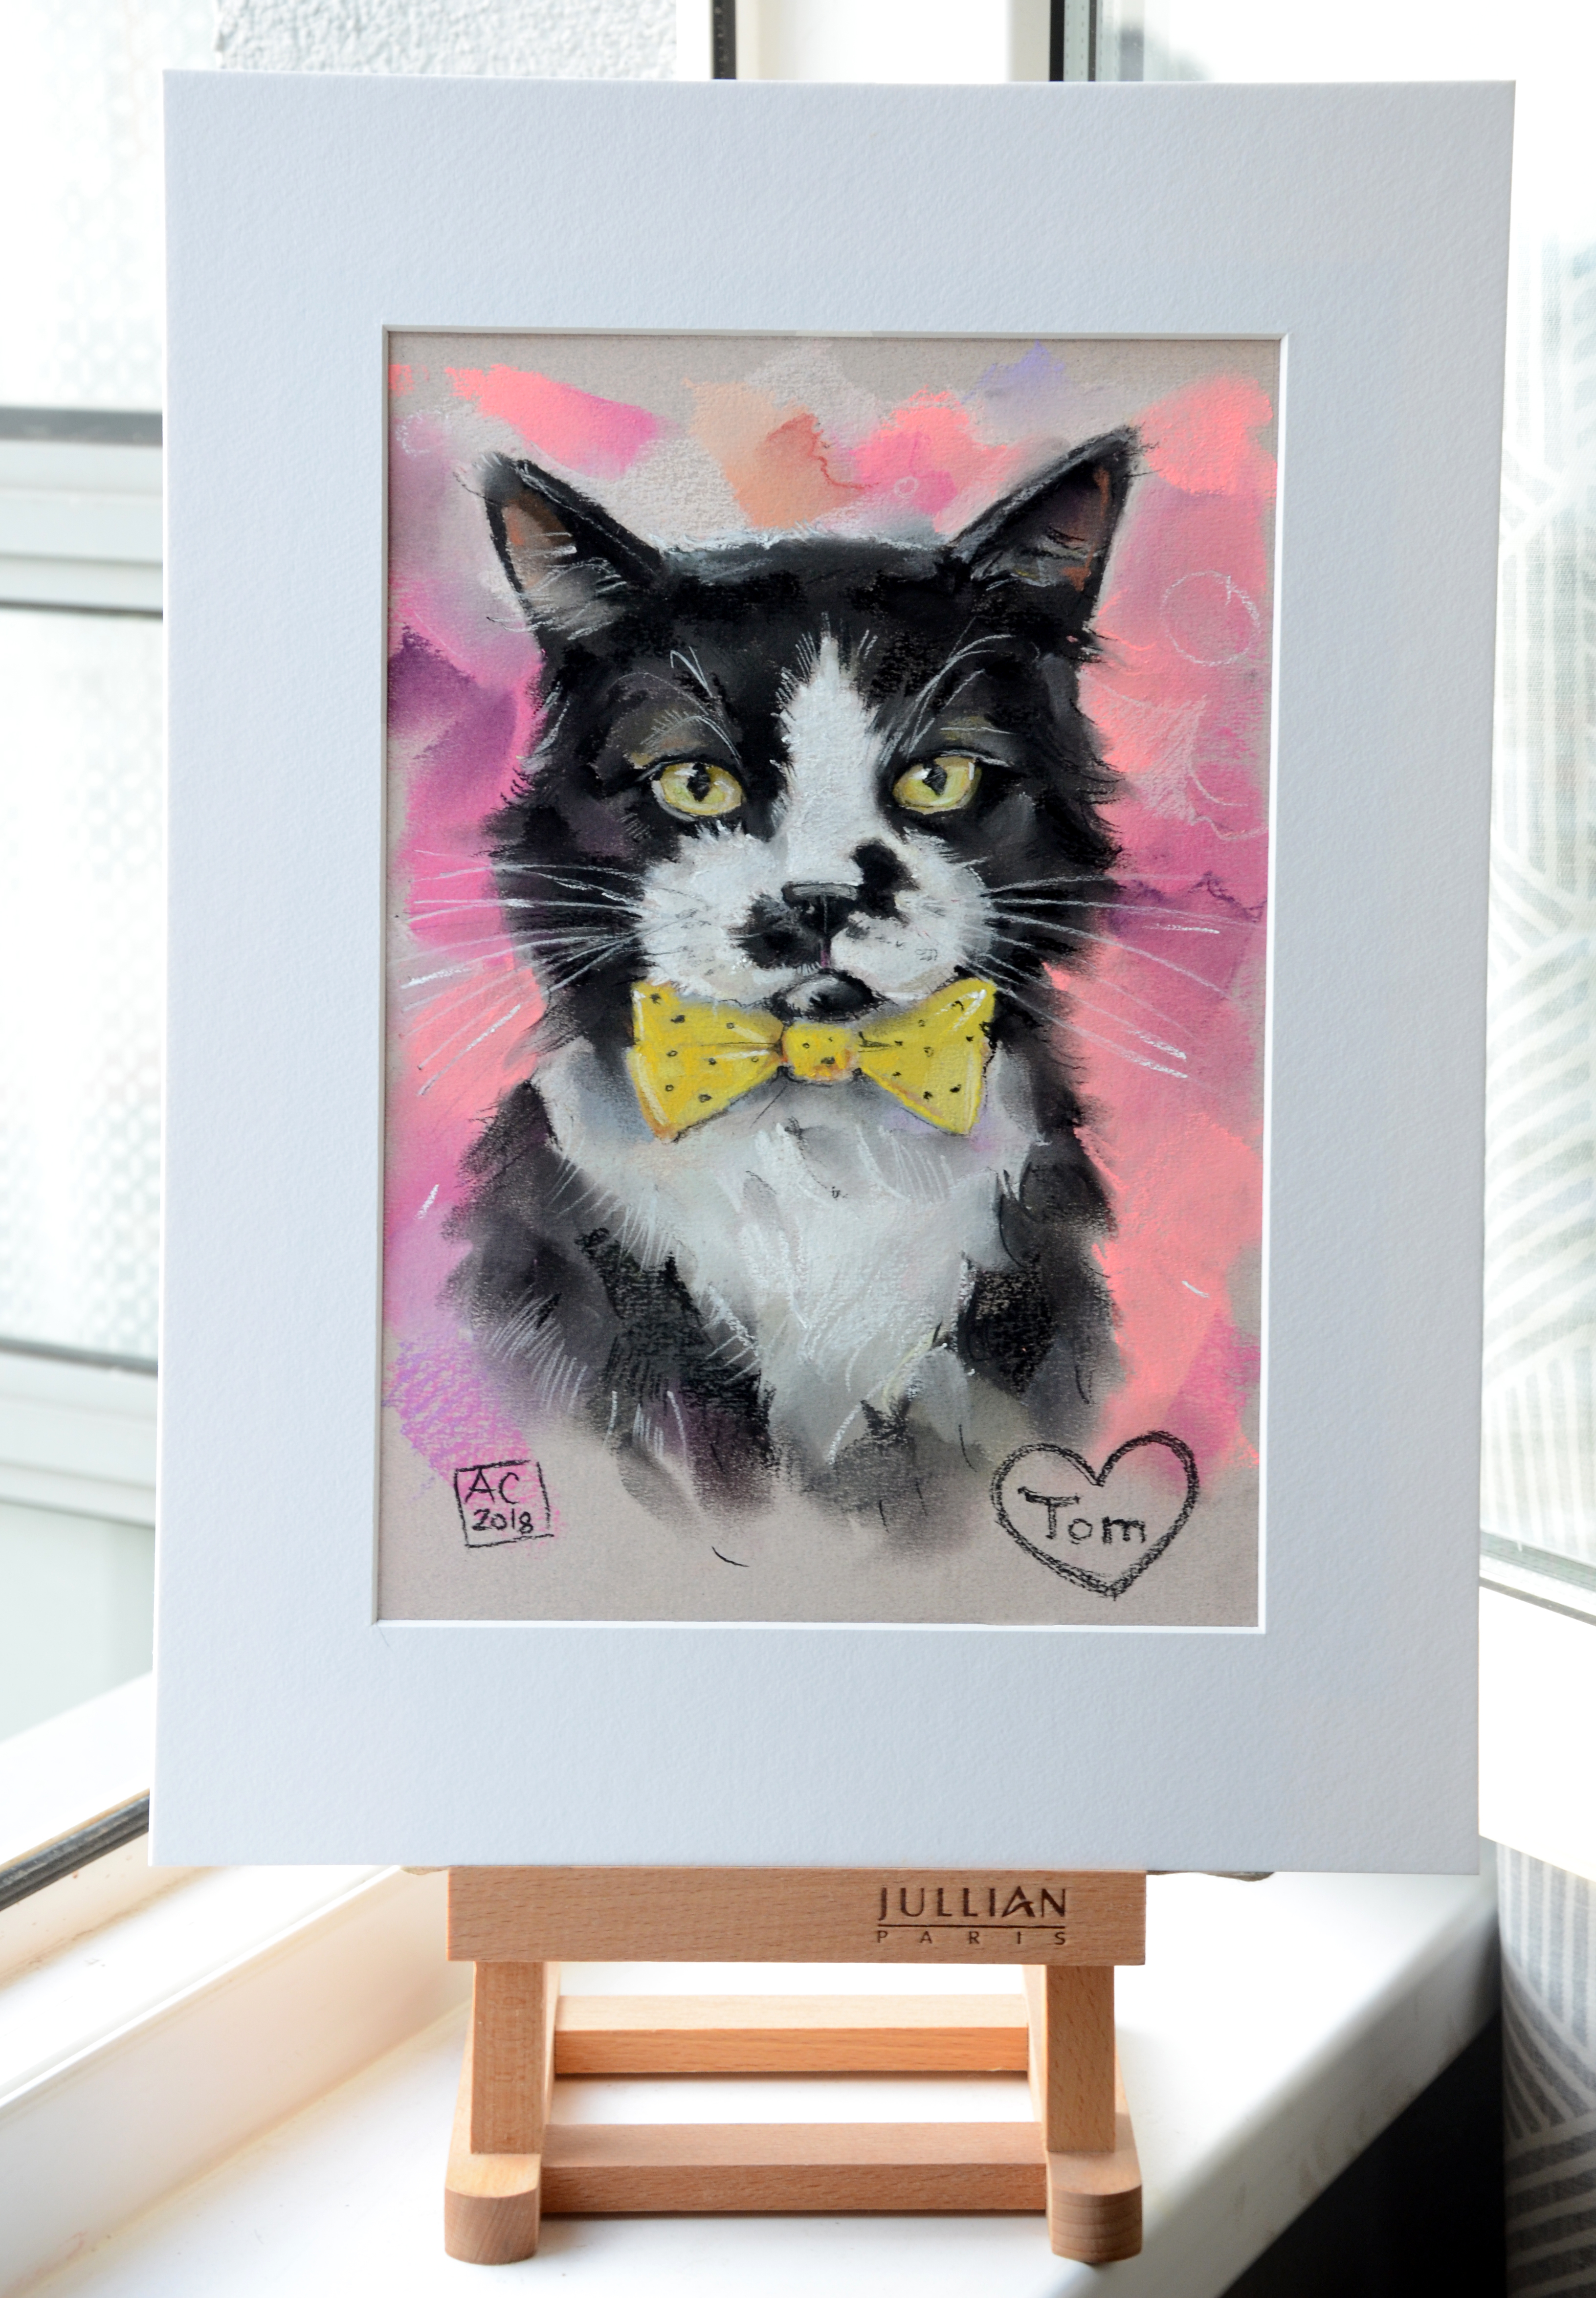 портрет кота тома, кот по фото, заказать портрет кота